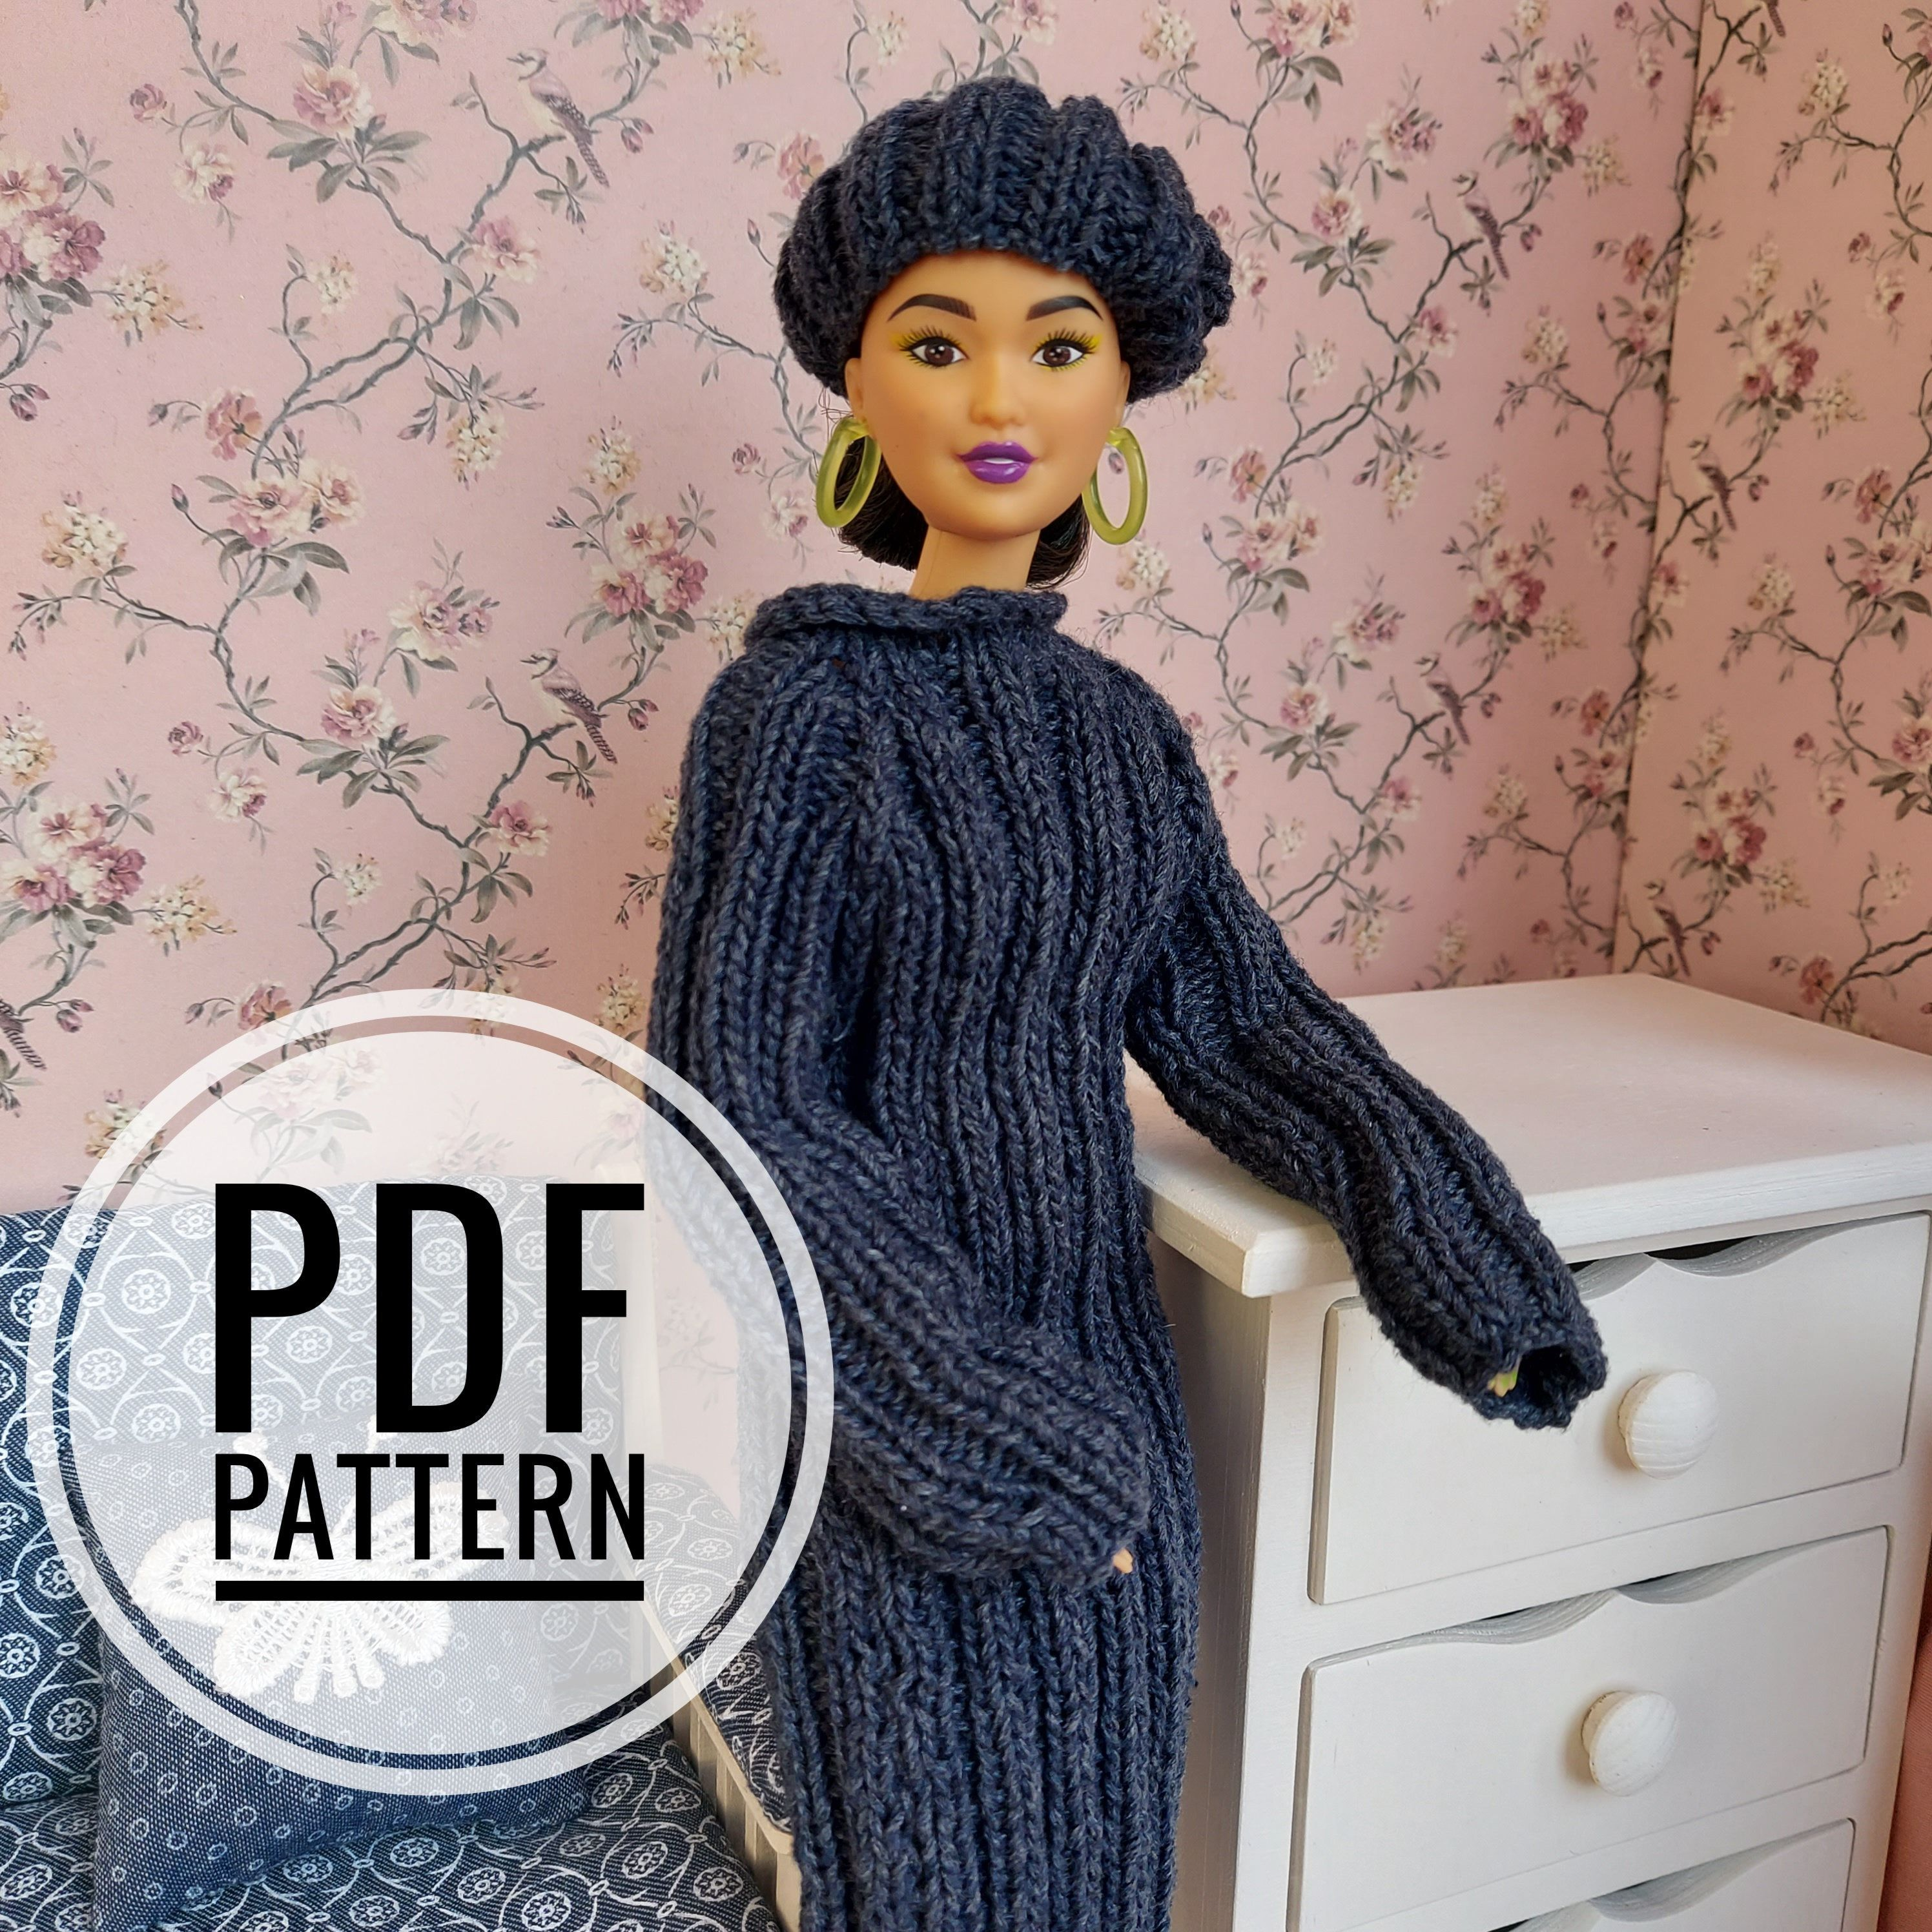 Barbie Knitting Pattern Barbie Sweater Dress Knit Tutorial Etsy Barbie Doll Clothing Patterns Barbie Knitting Patterns Barbie Clothes [ 2992 x 2992 Pixel ]